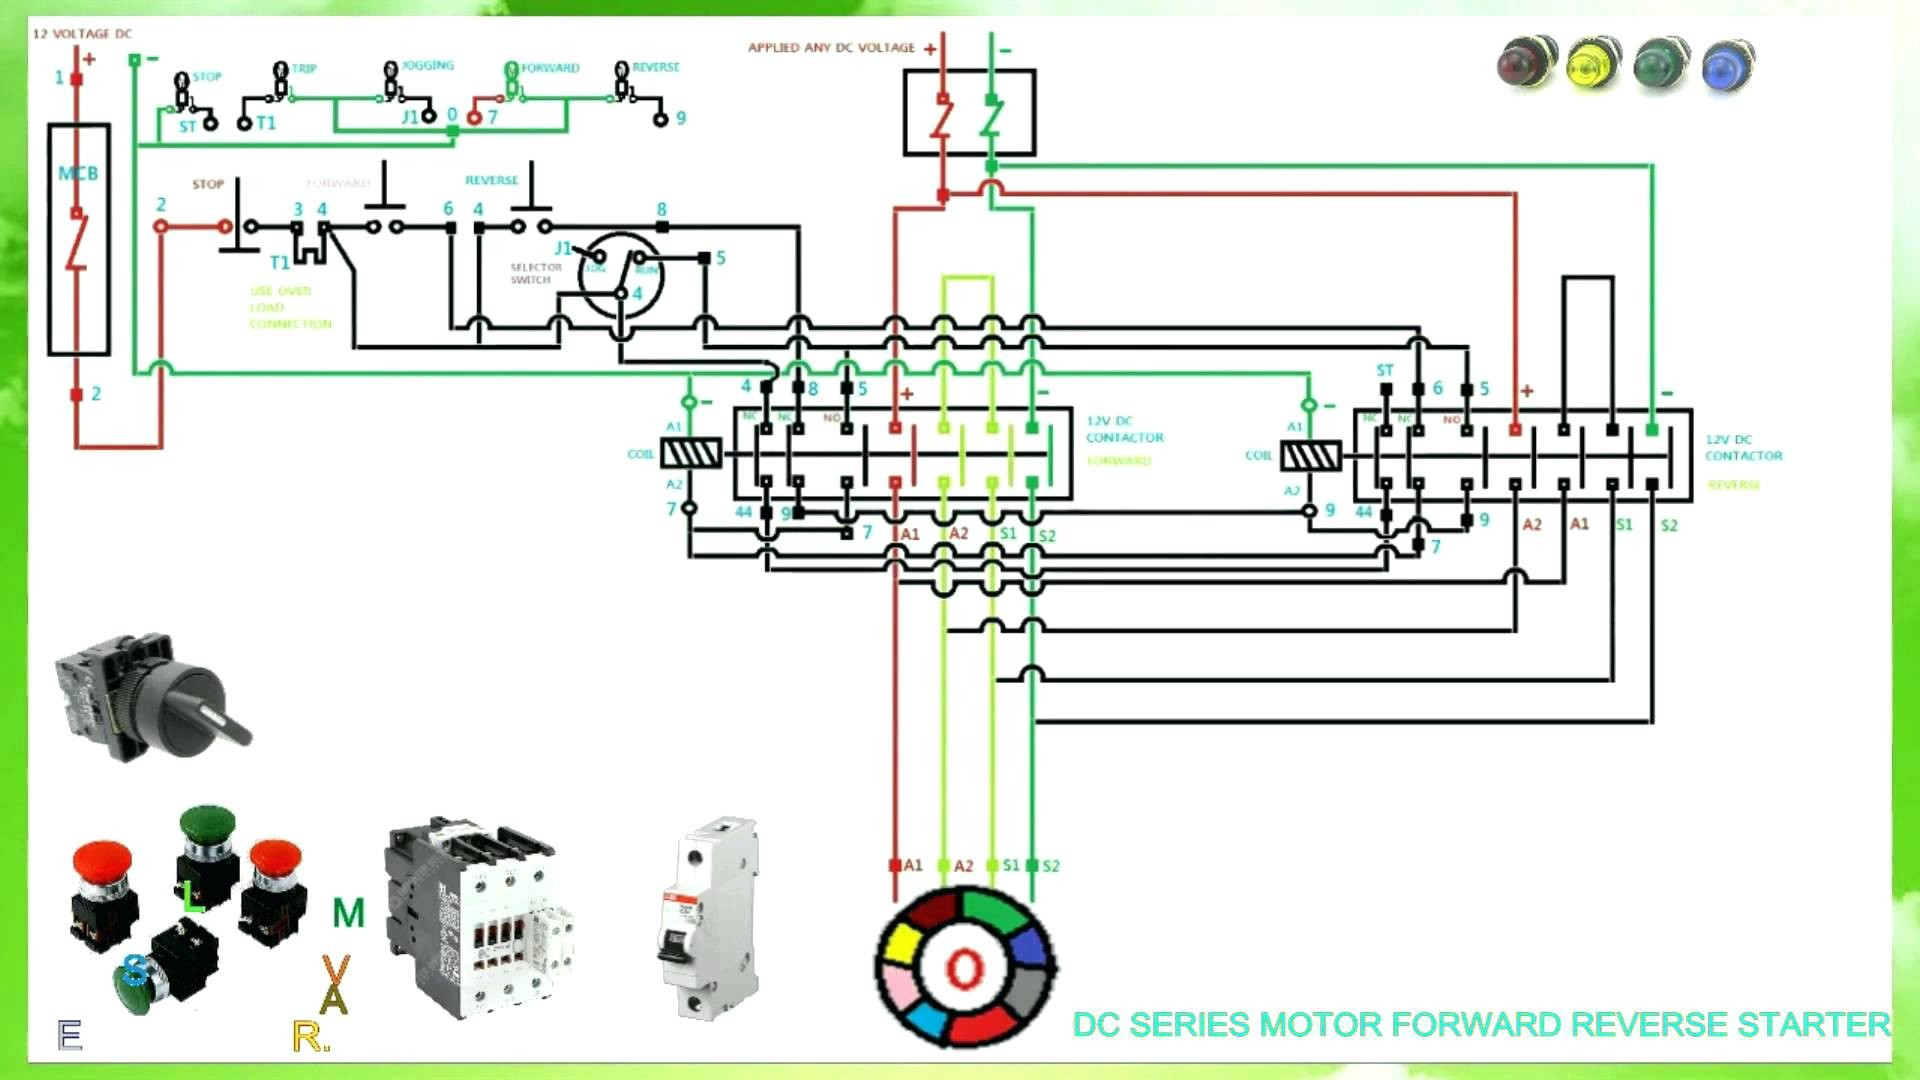 hight resolution of 3 phase starter wiring diagram dol motor control wiring diagram for3 phase starter wiring diagram dol